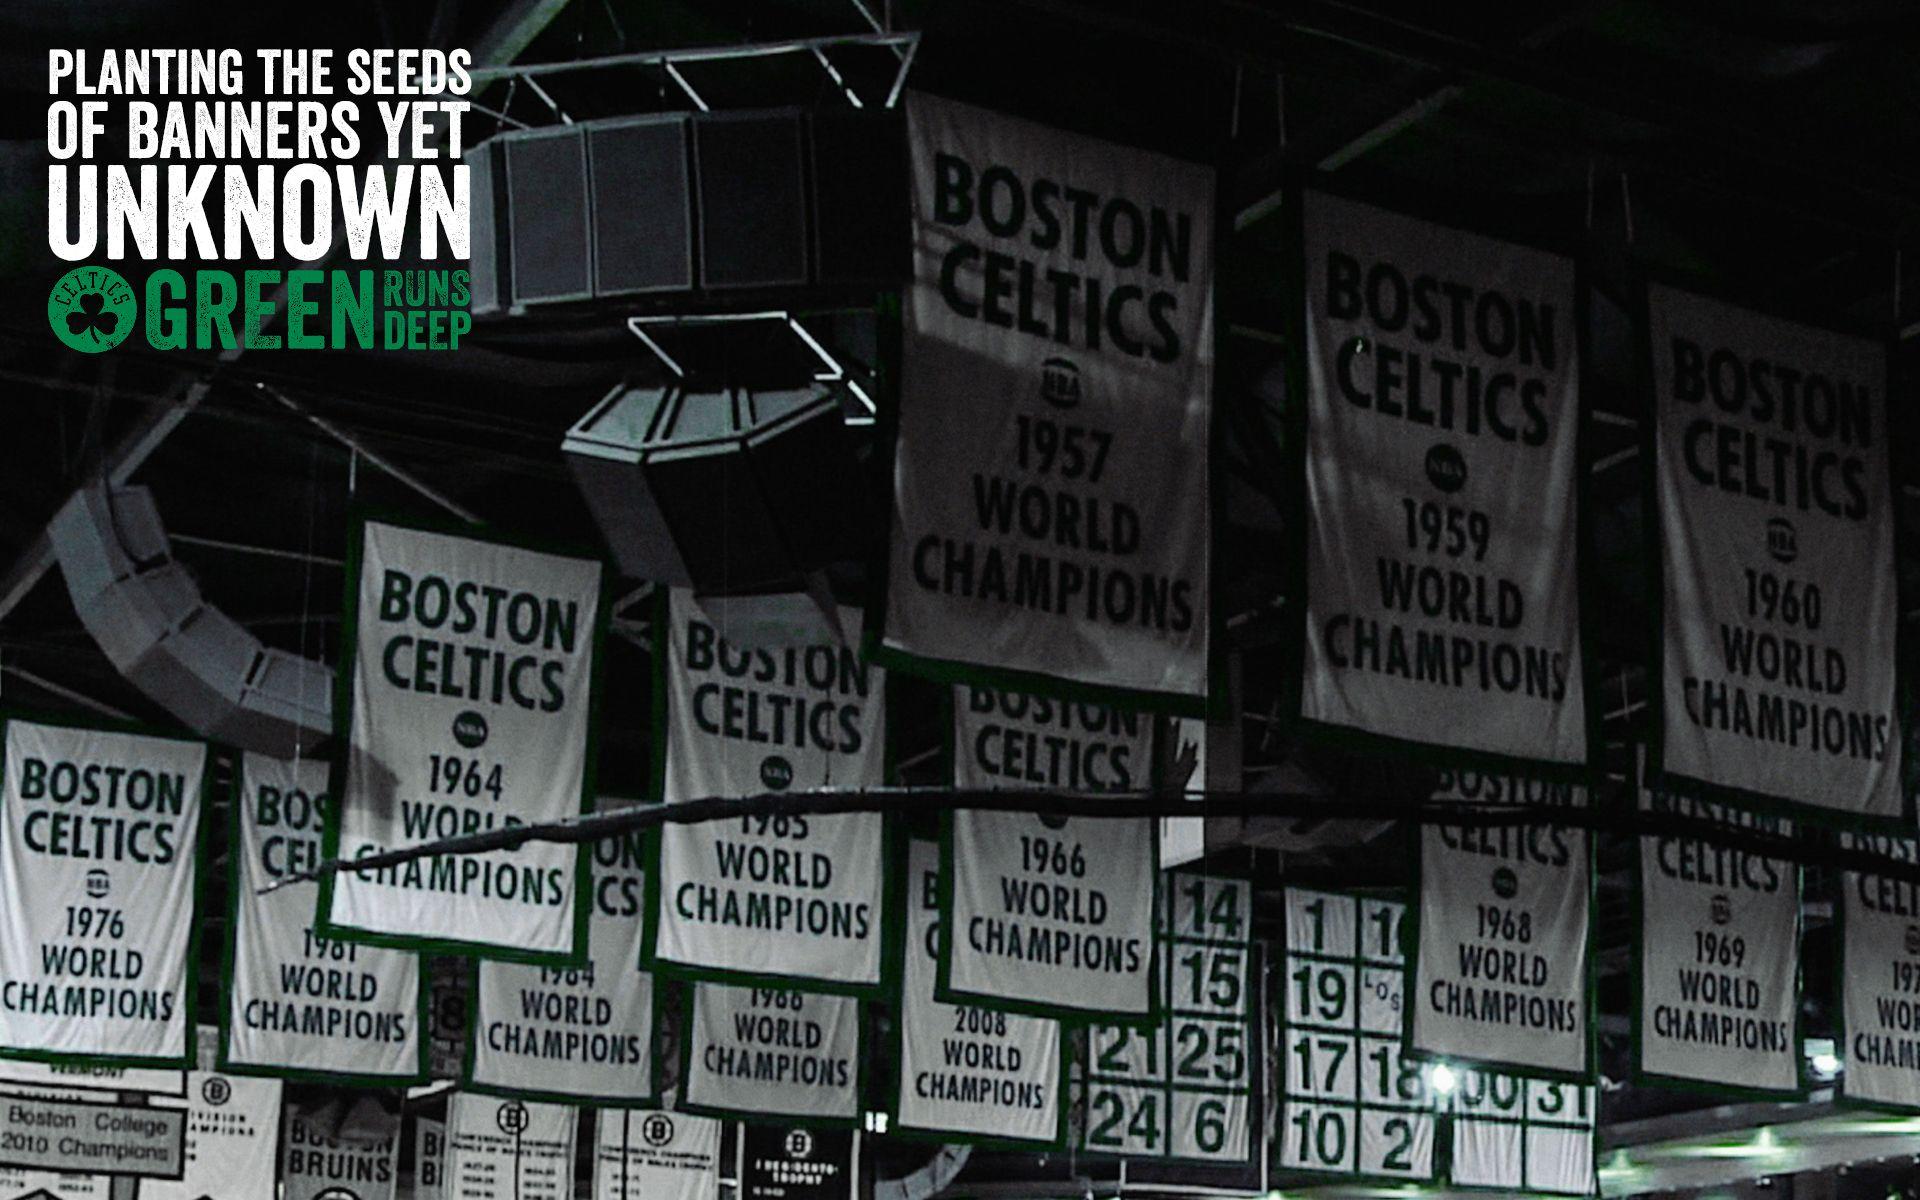 Boston Celtics Live Wallpaper Best Wallpaper Hd Boston Celtics Wallpaper Boston Celtics Celtic